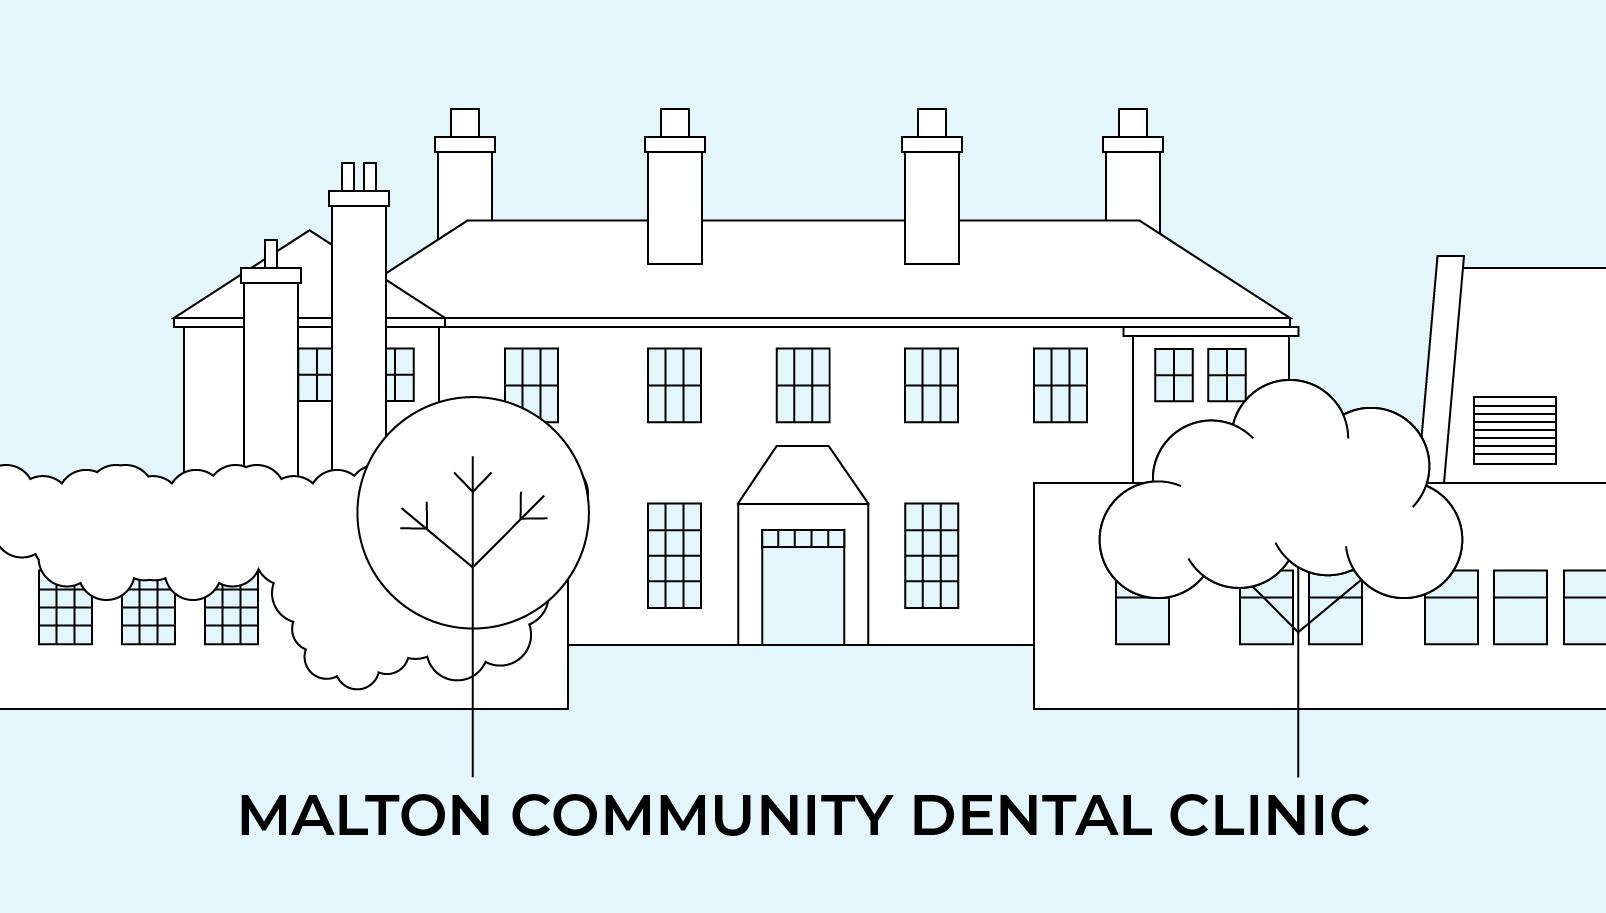 Malton Community Dental Clinic